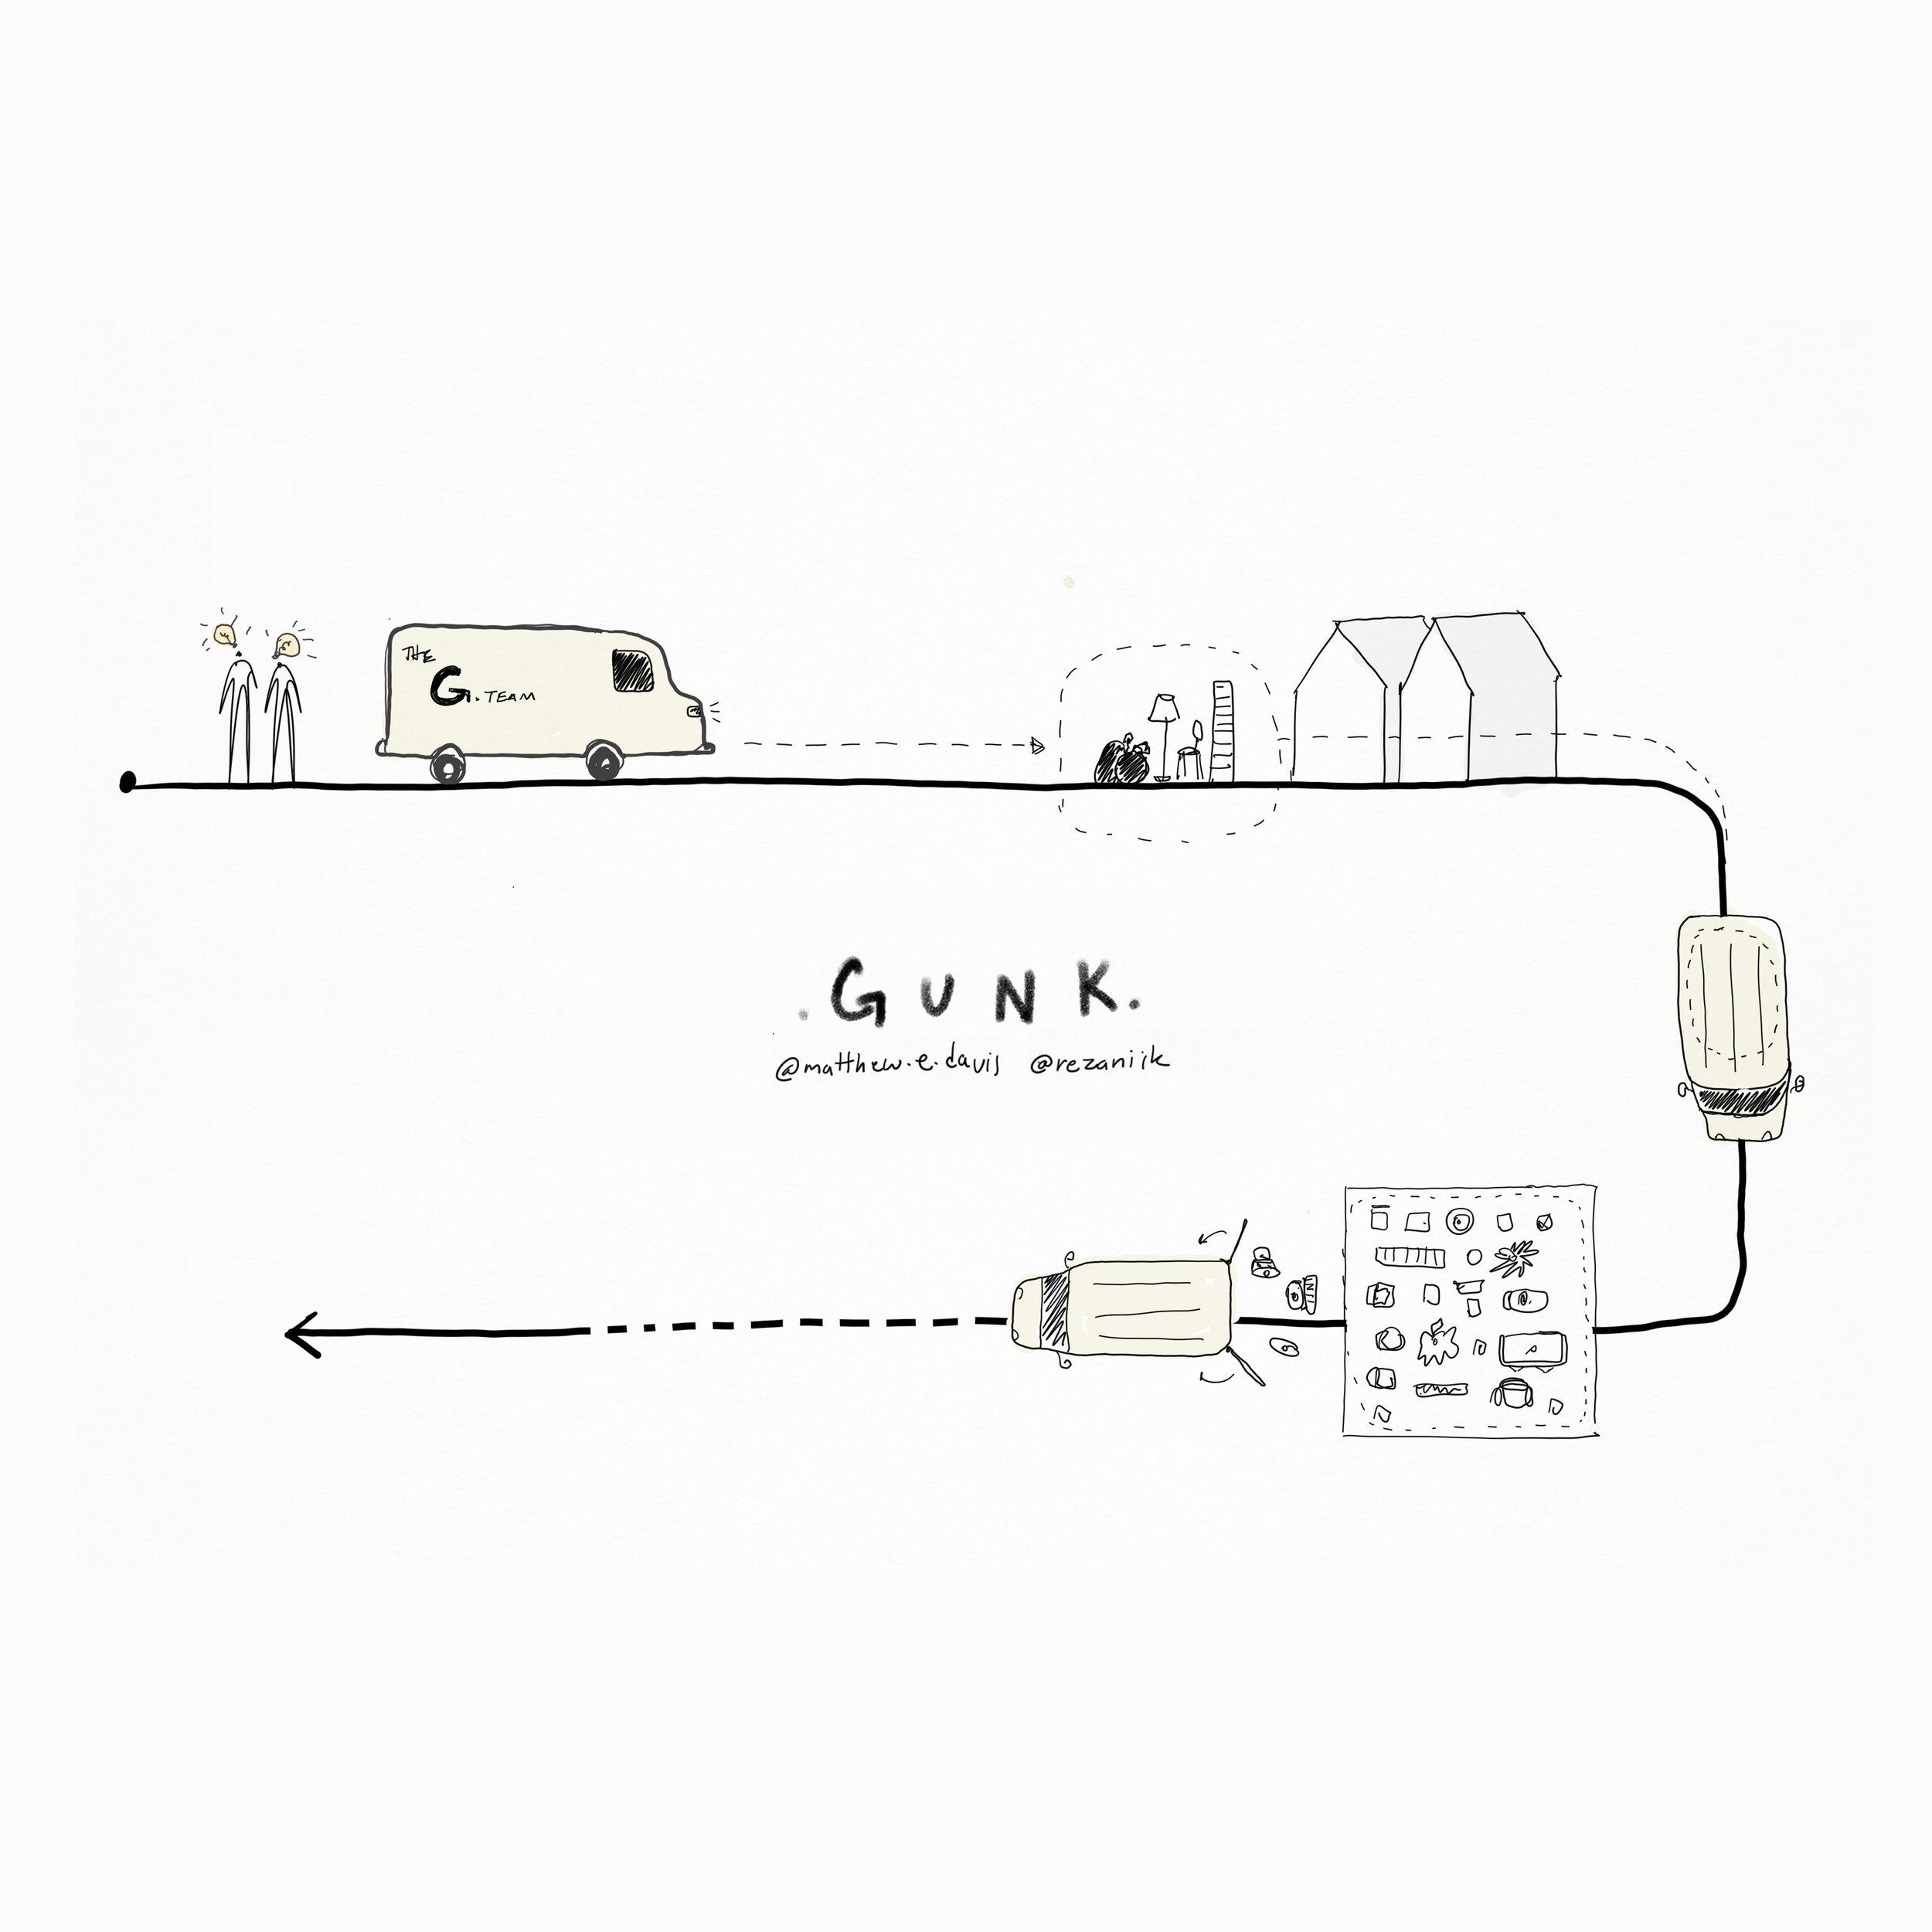 GUNK - diagram sketch4_square.jpg